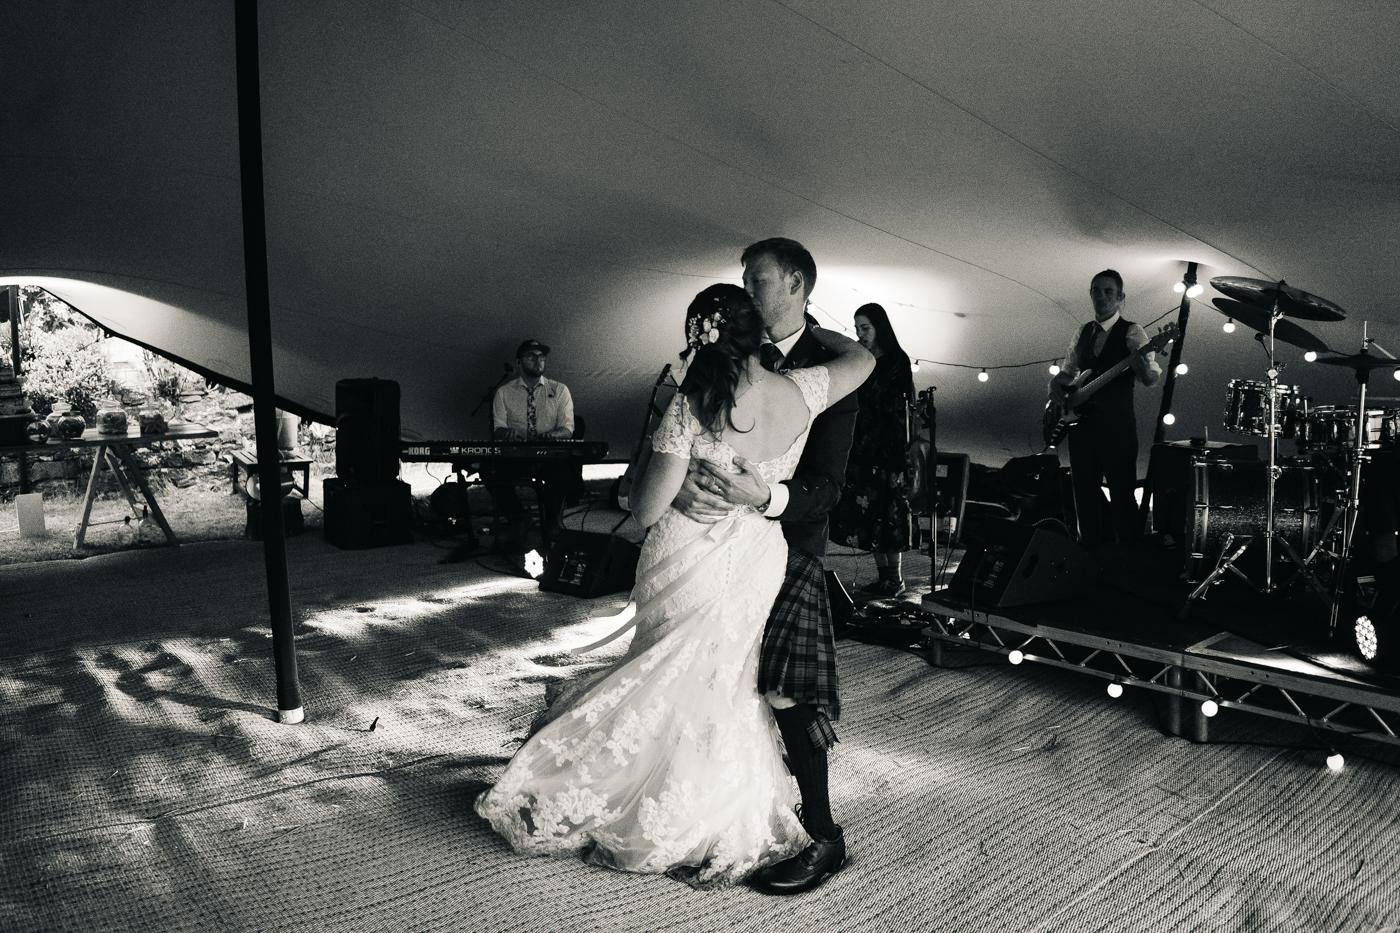 scottish-wedding-trossachs-loch-tay-highlannds-relaxed-photography-photographer-0048.jpg